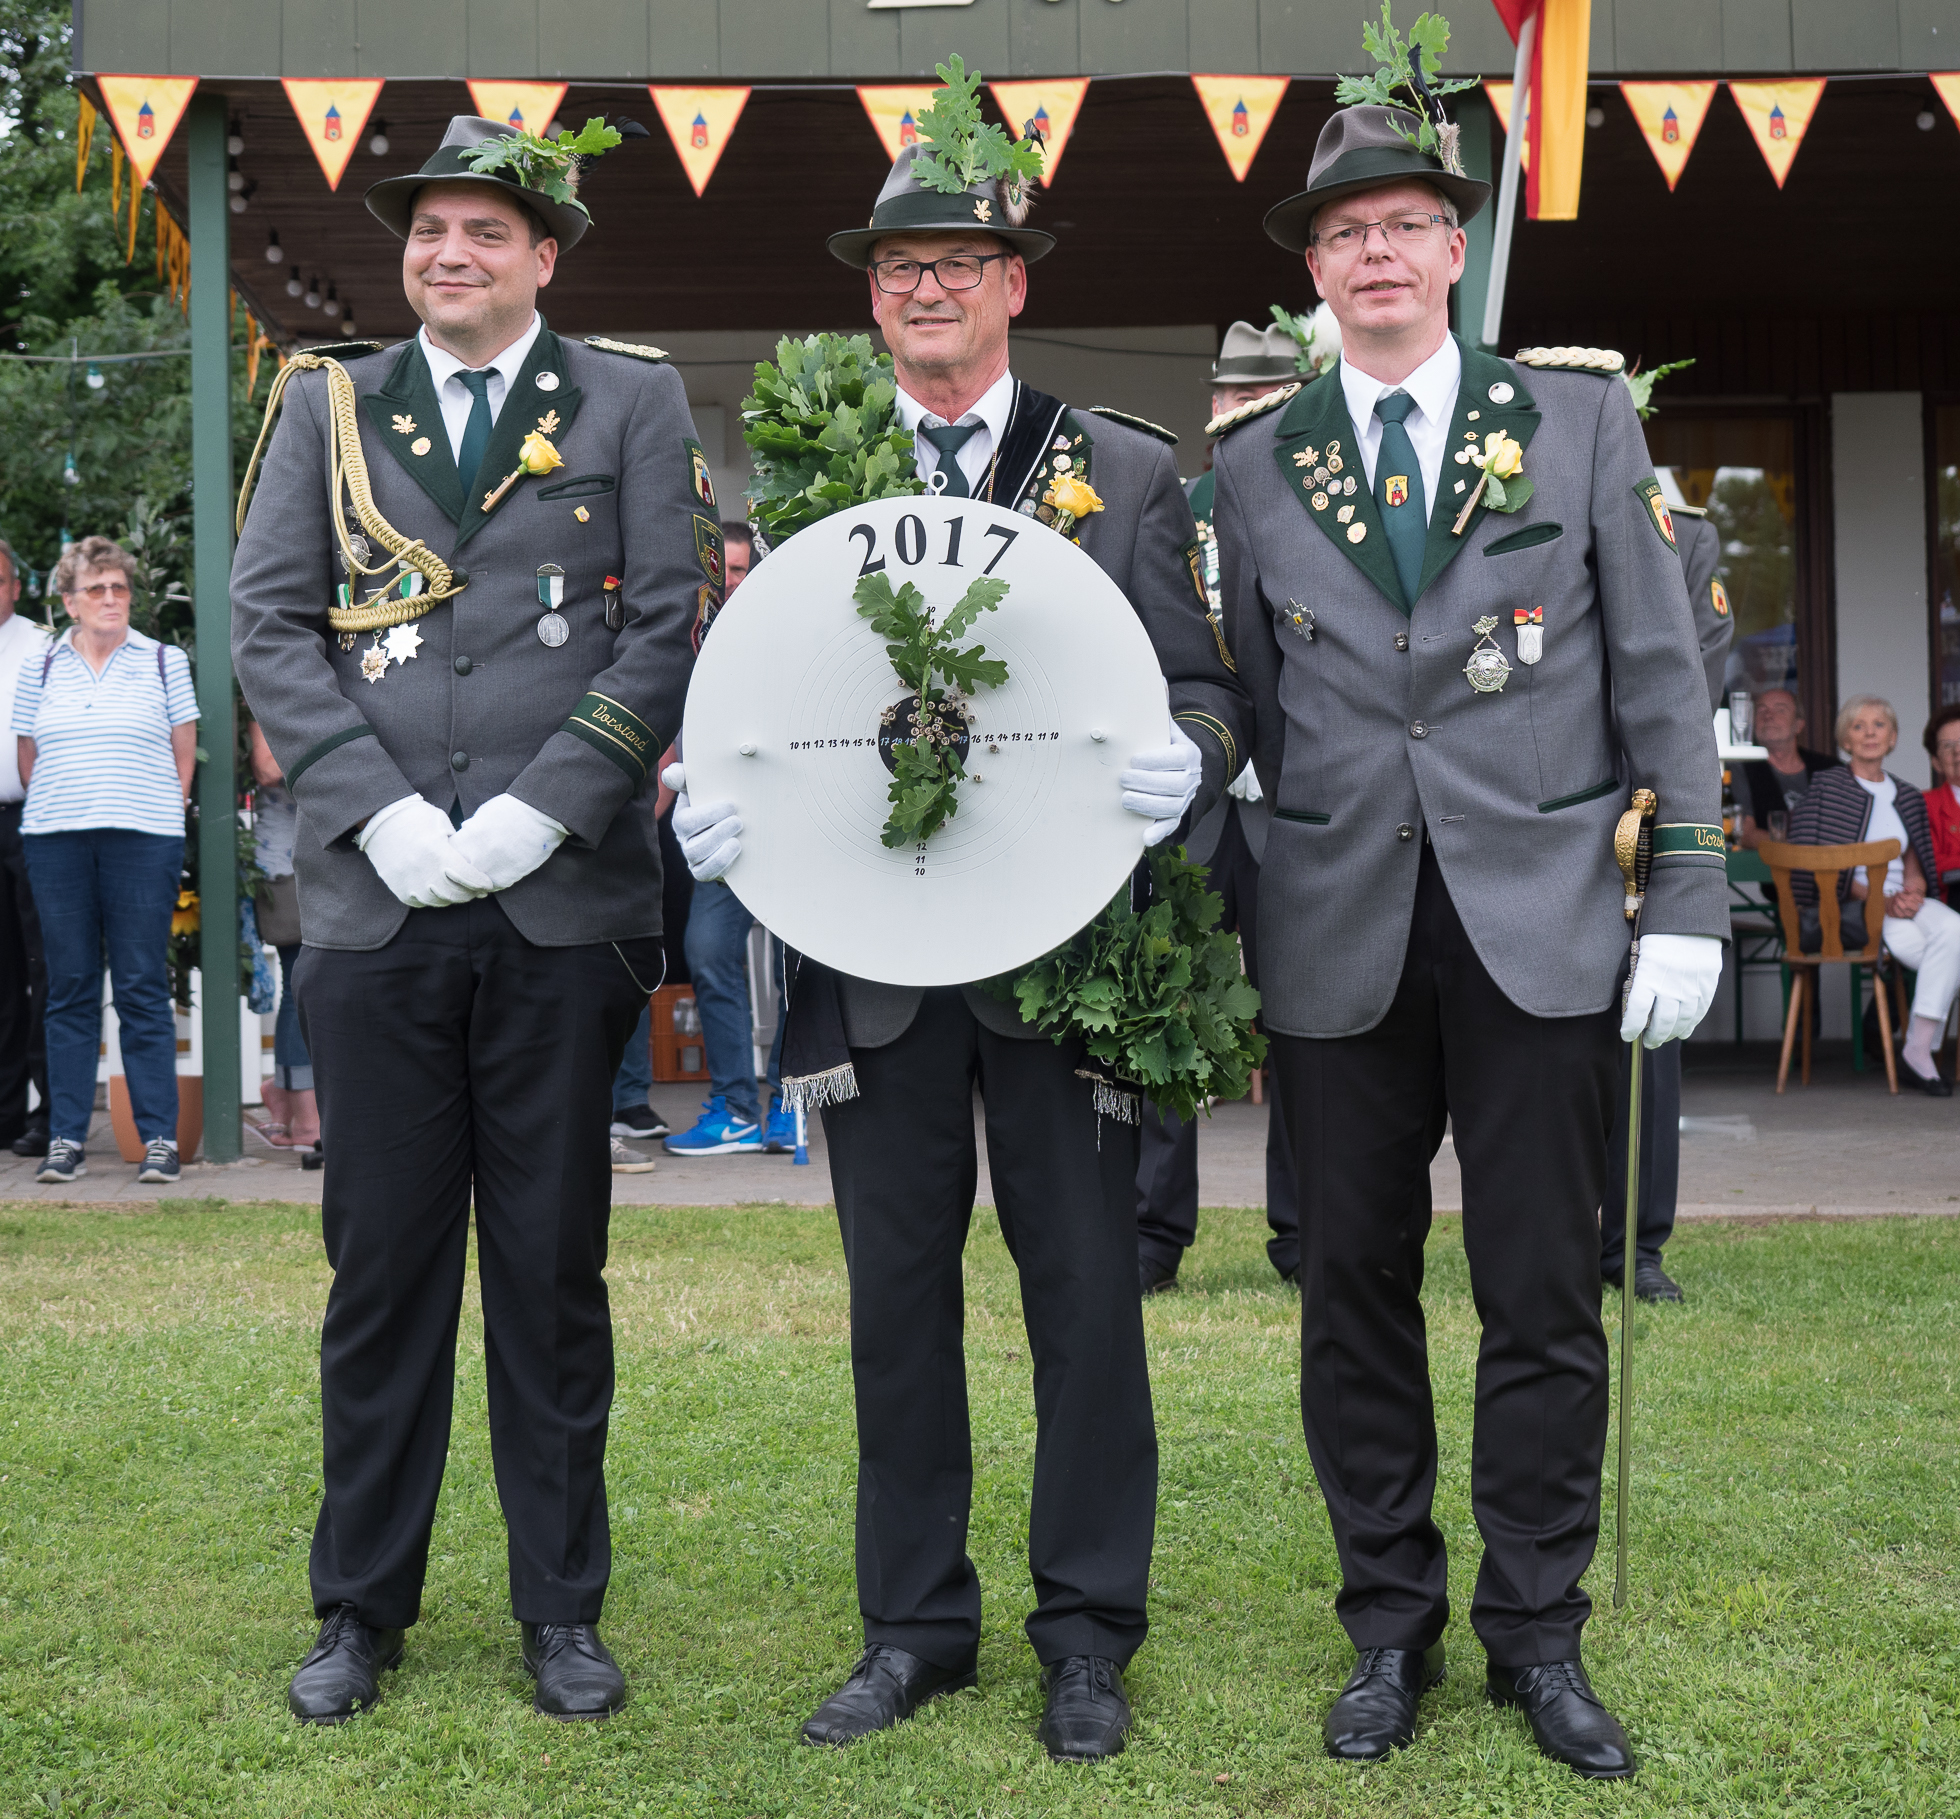 König, Adjutant und Oberst